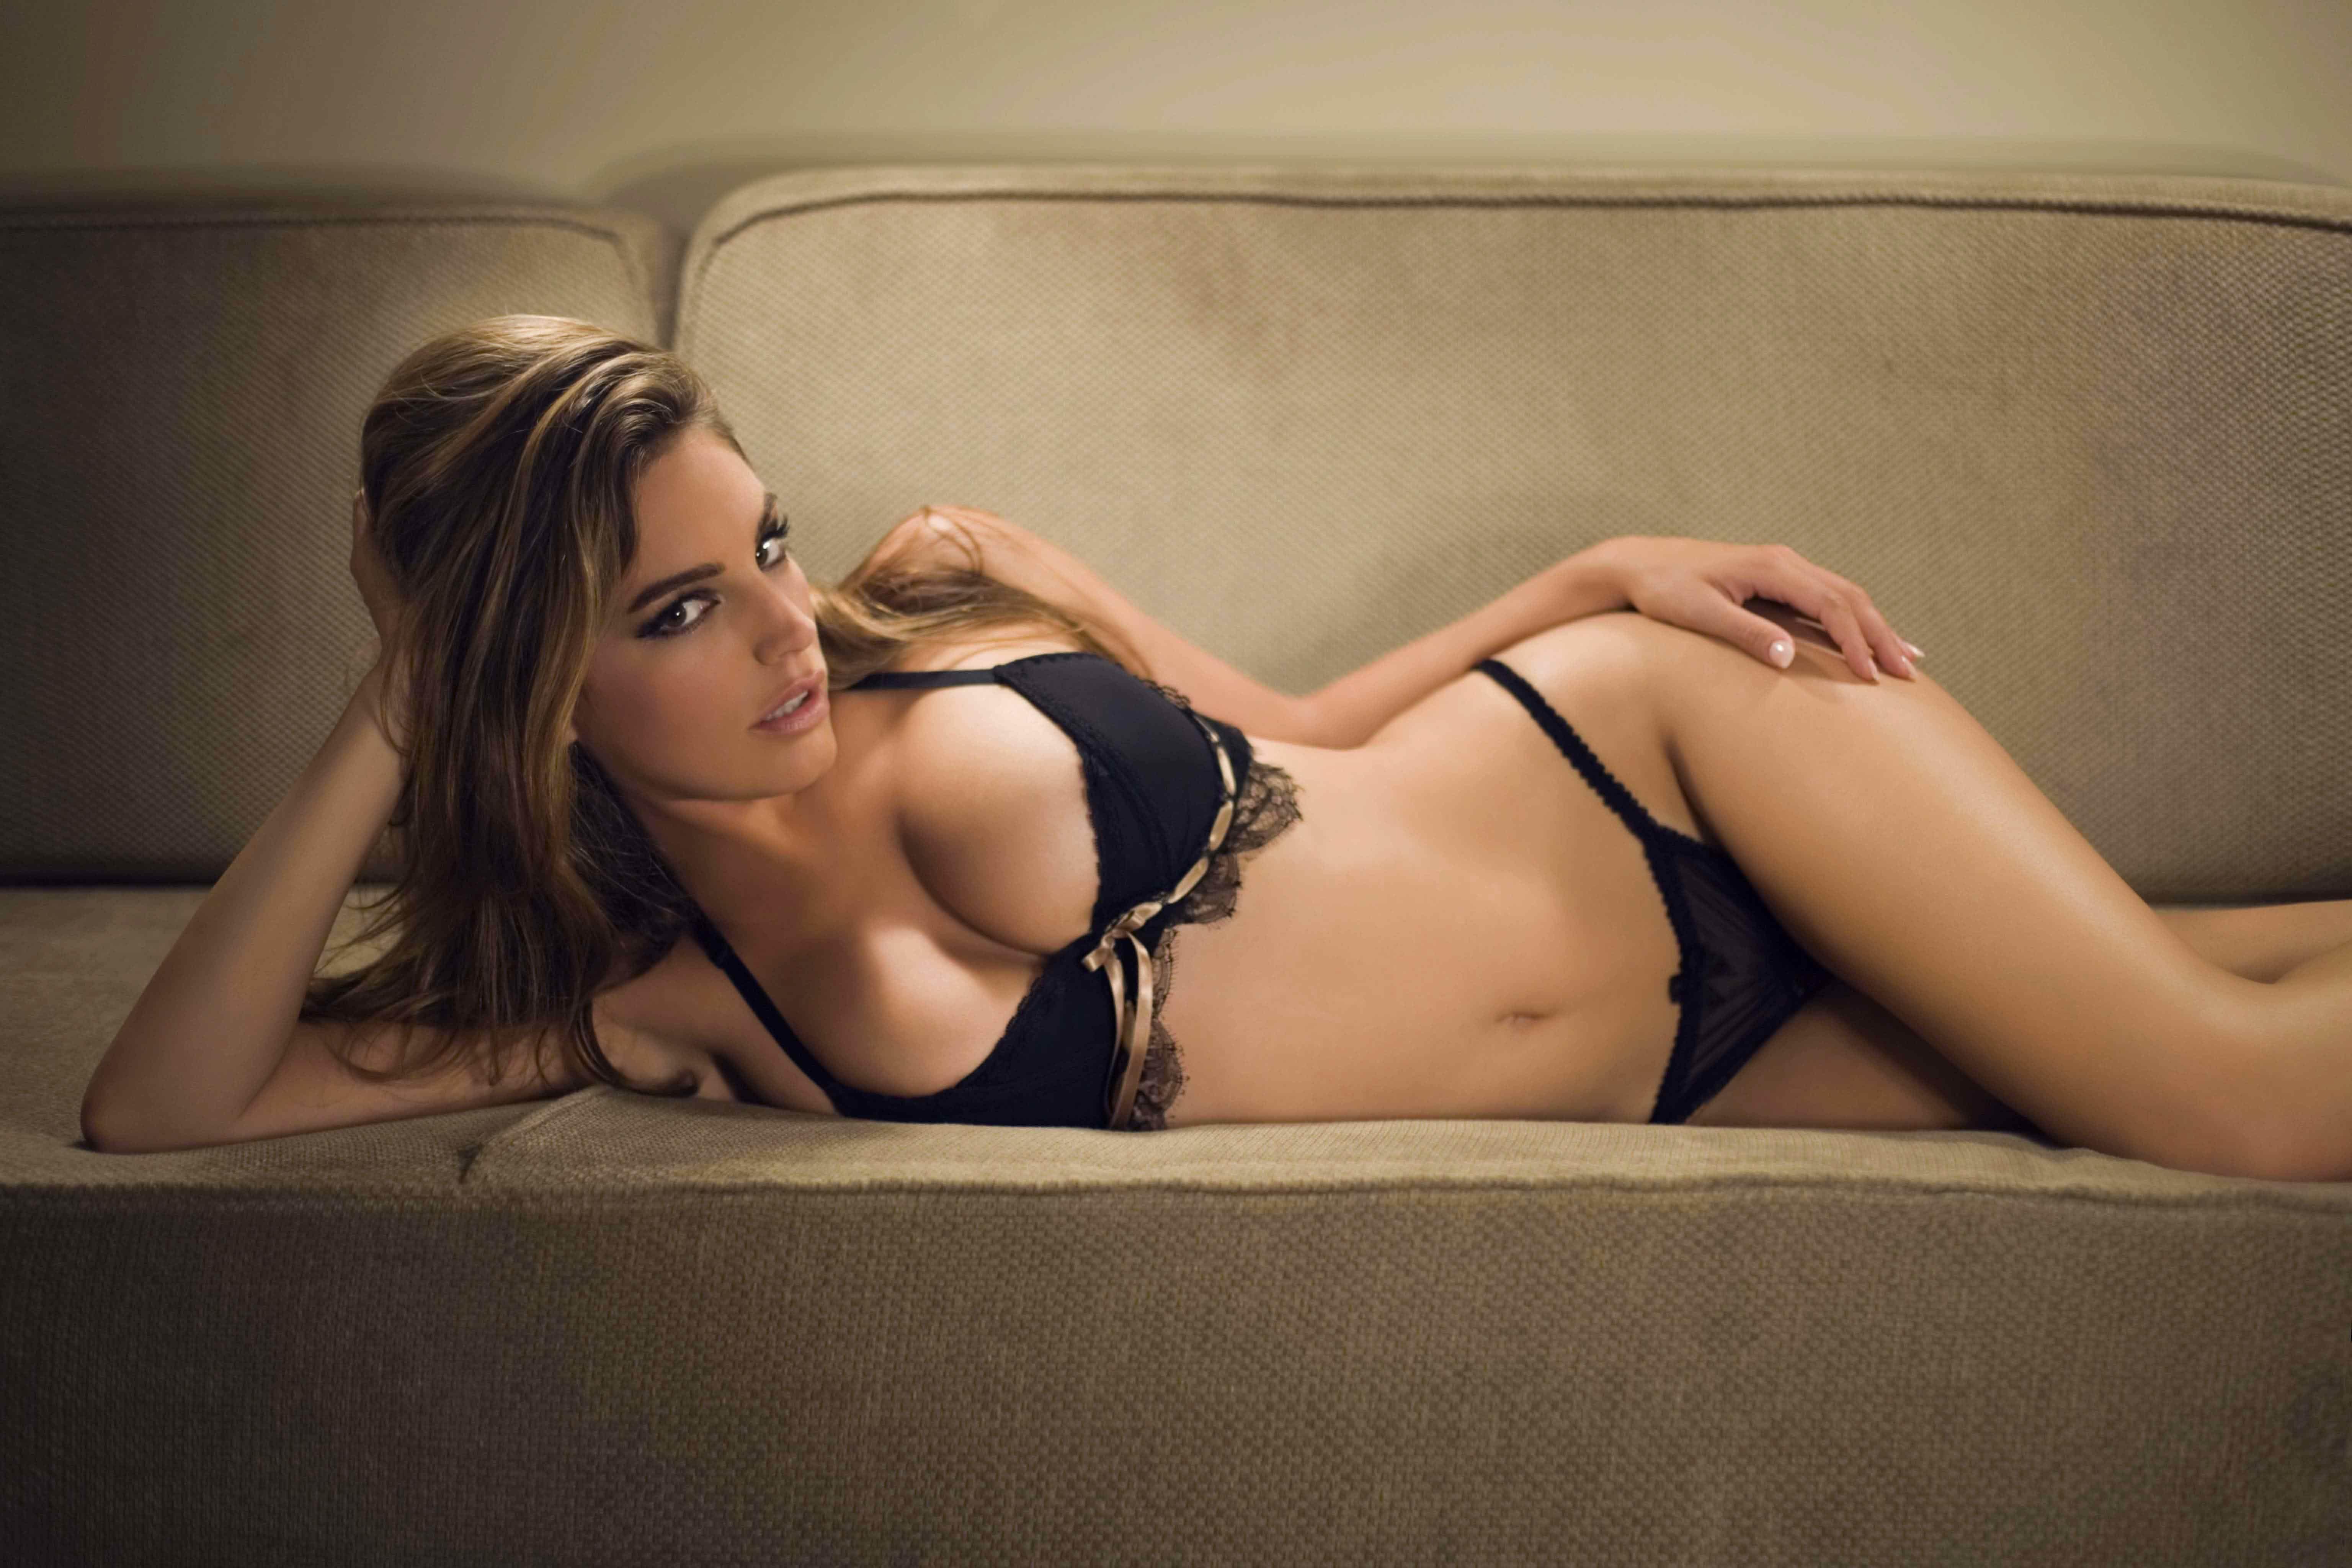 Most sexiest nude women in world